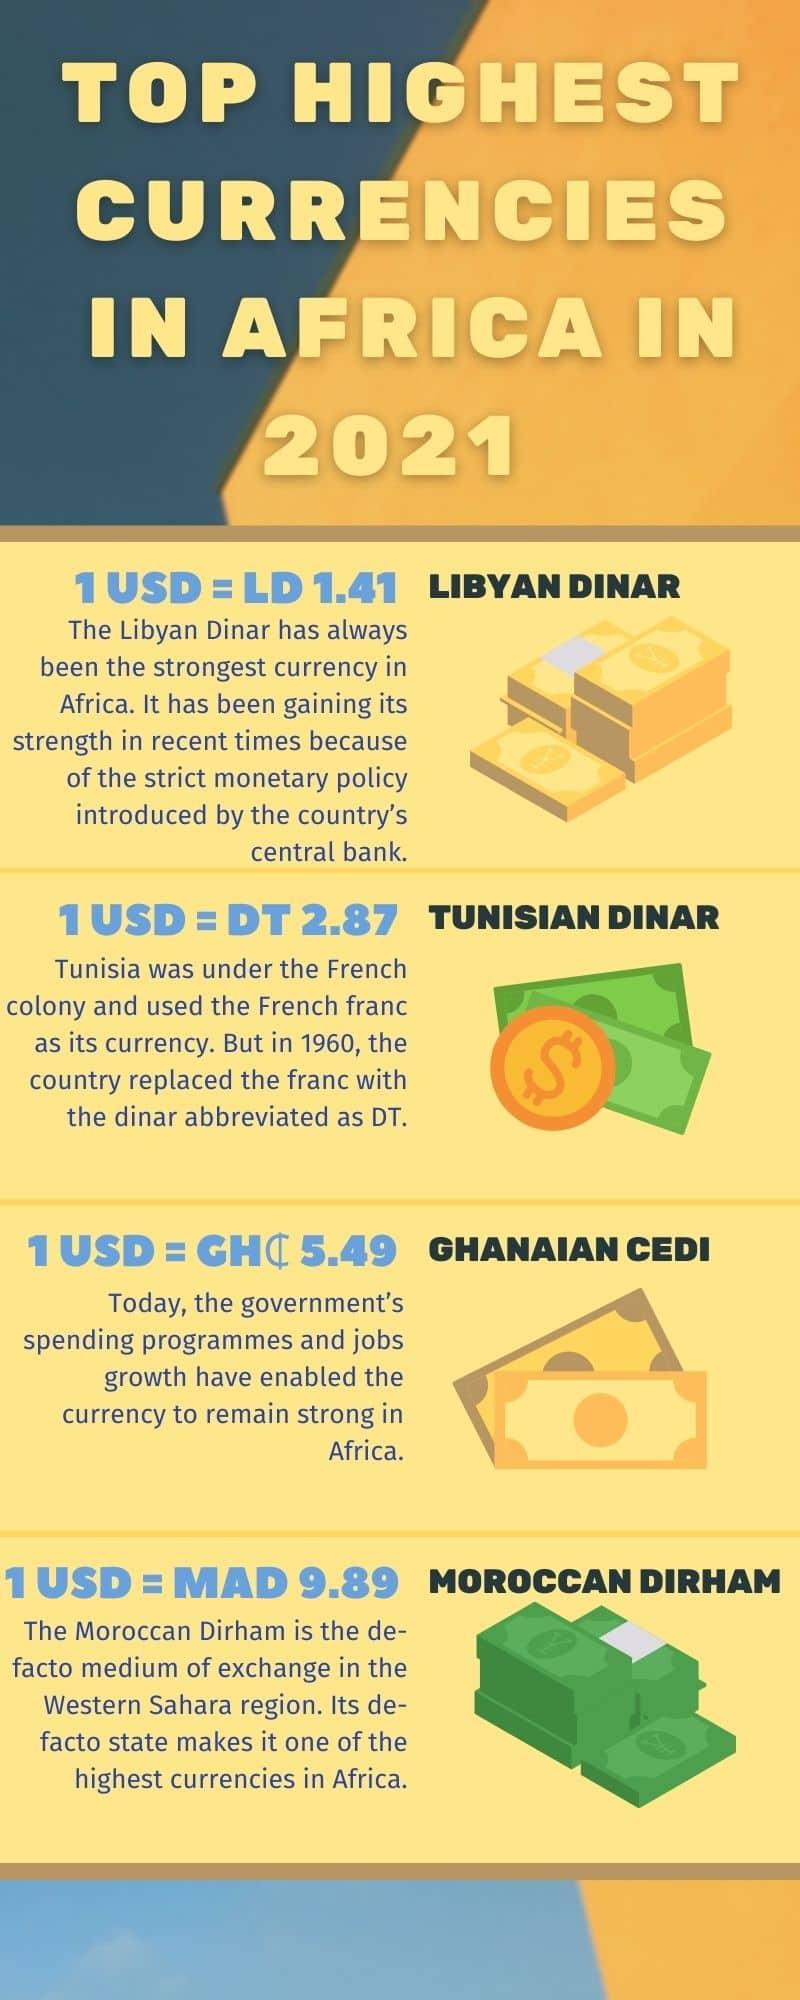 Top highest currencies in Africa